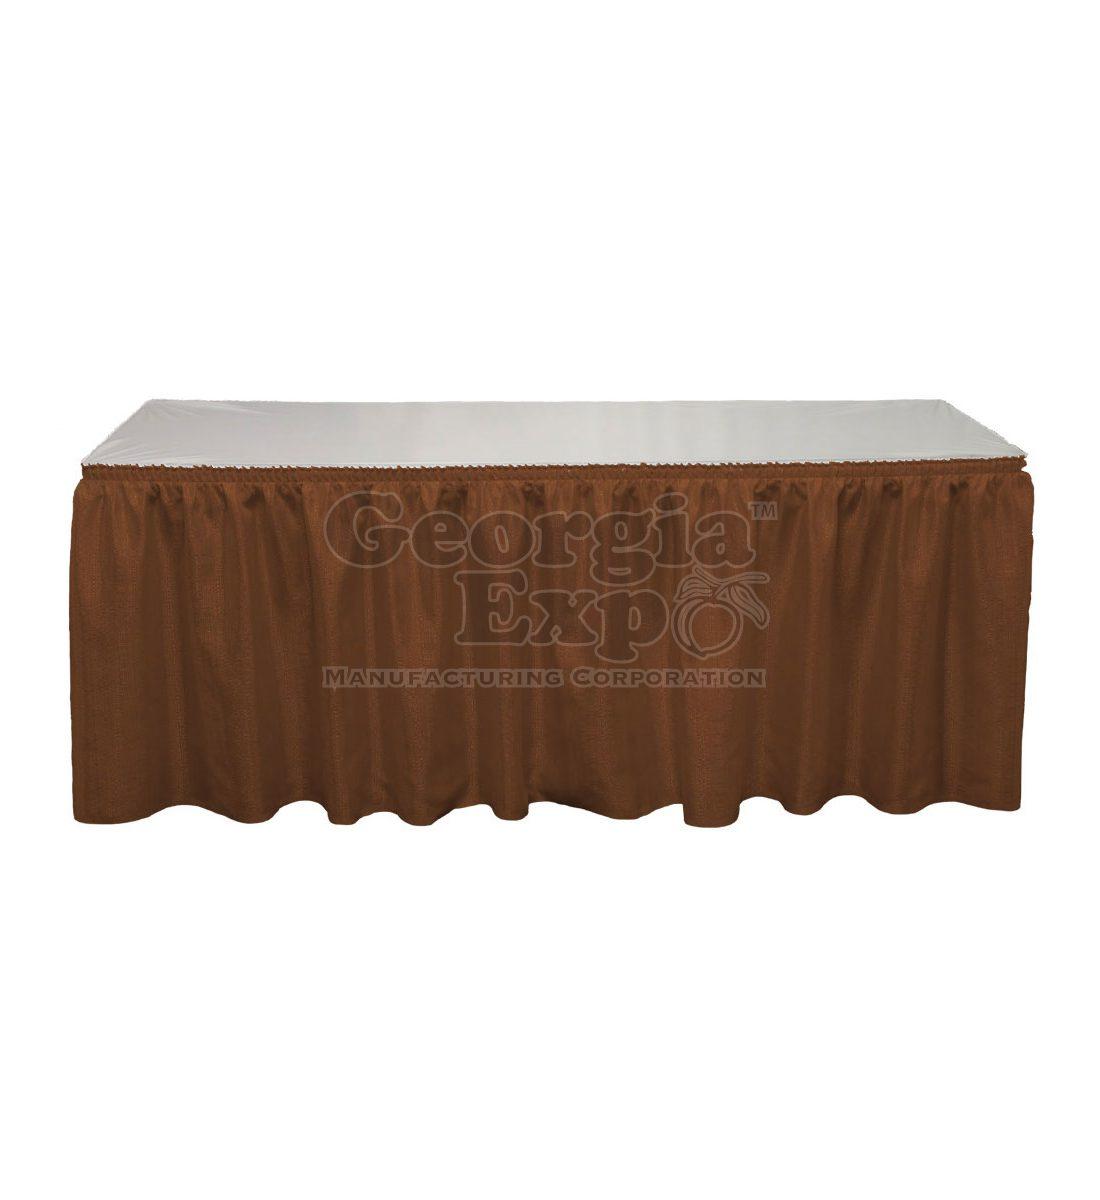 Banjo table skirting table skirting georgia expo - Bordure aluminium jardin leroy merlin creteil ...